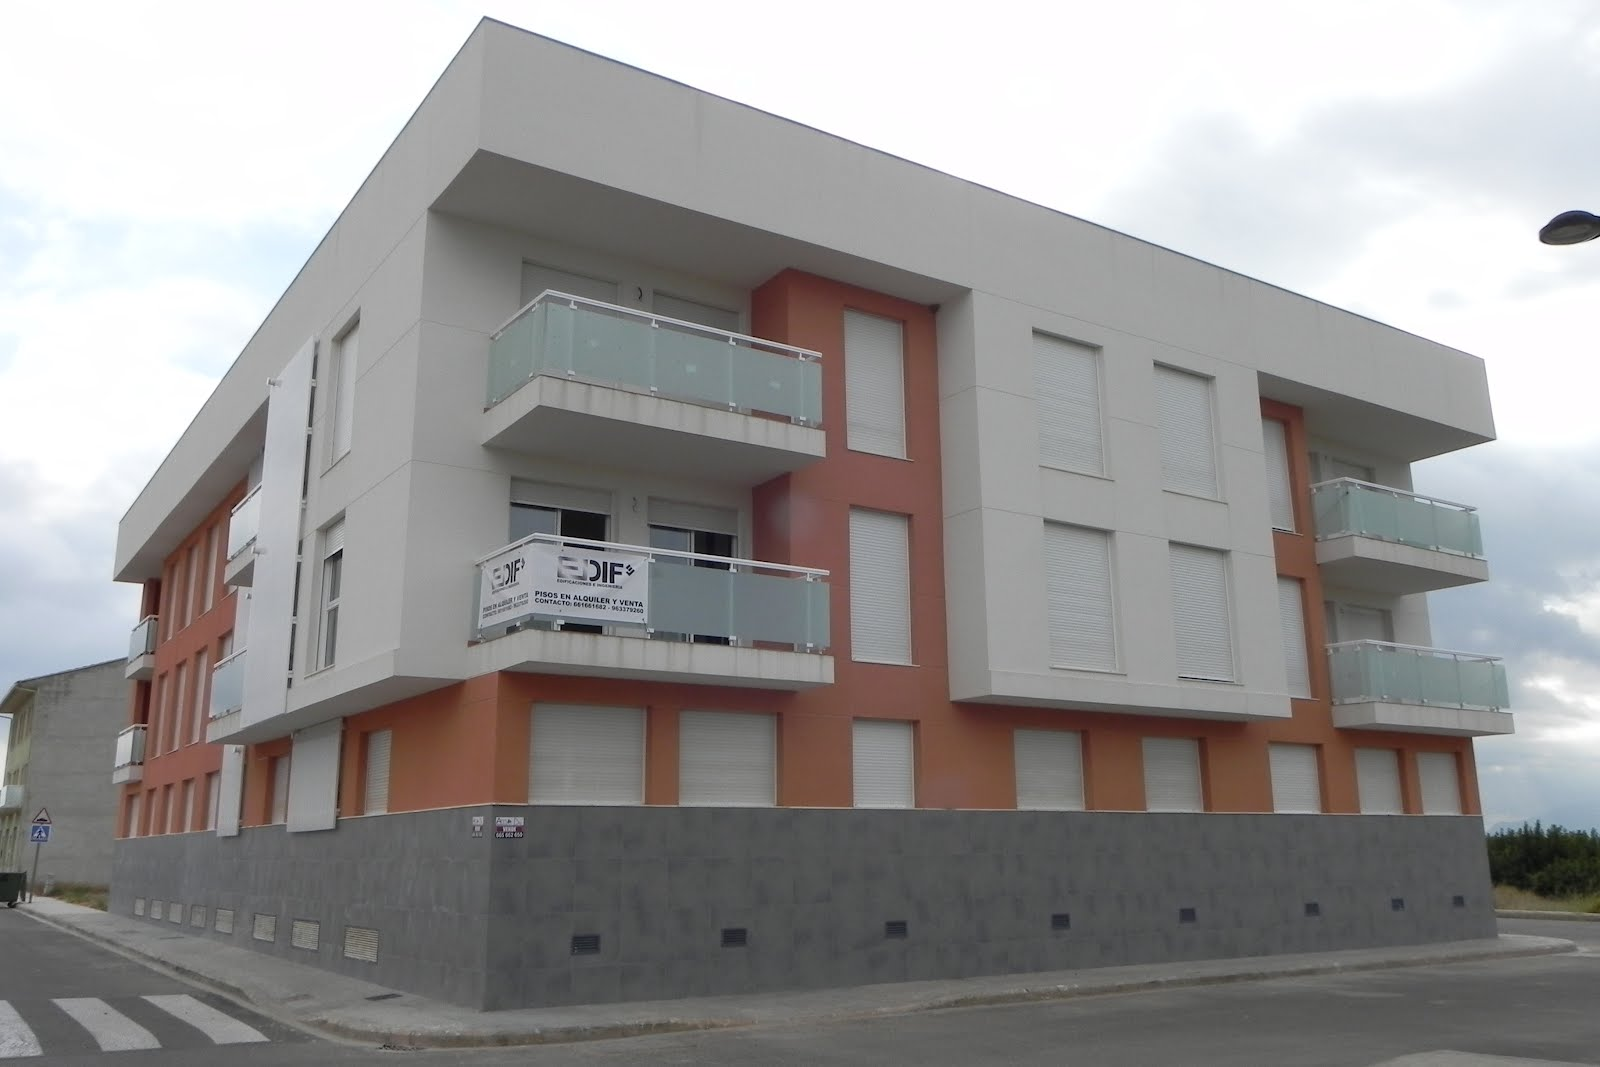 Arquitecto tecnico e ingeniero de edificacion 17 - Arquitectos en valencia ...